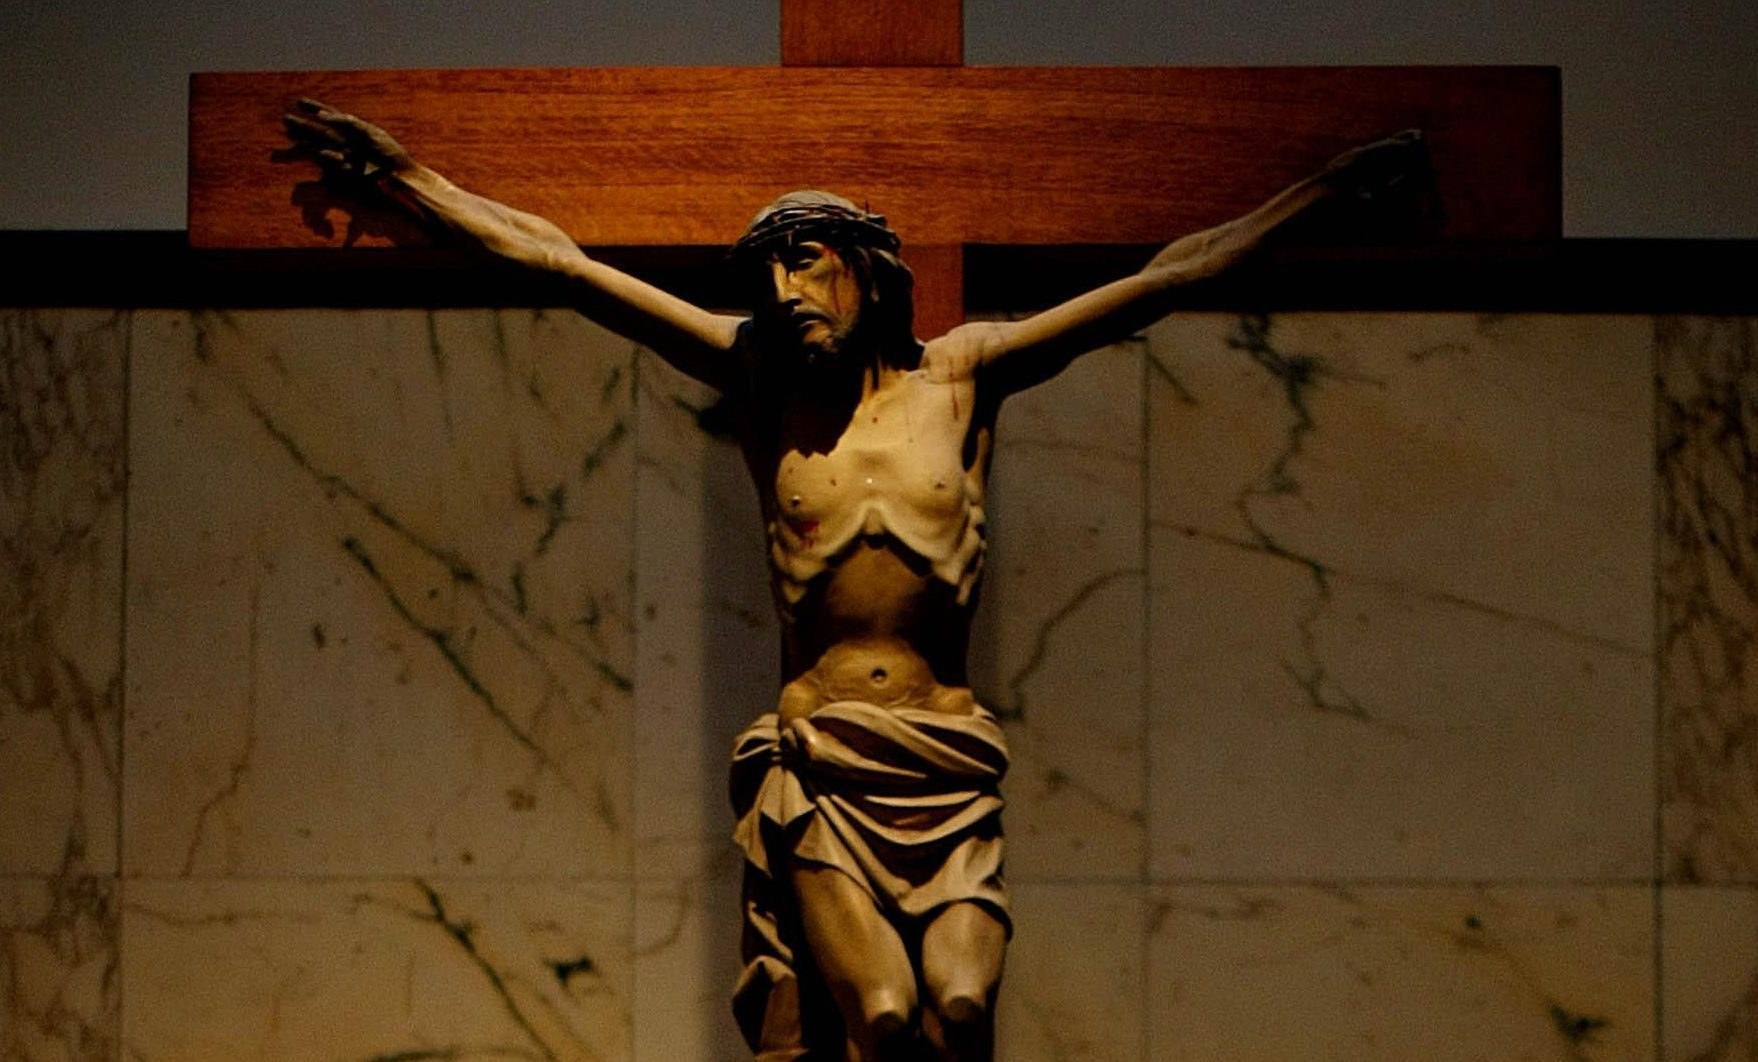 Christ on the cross.